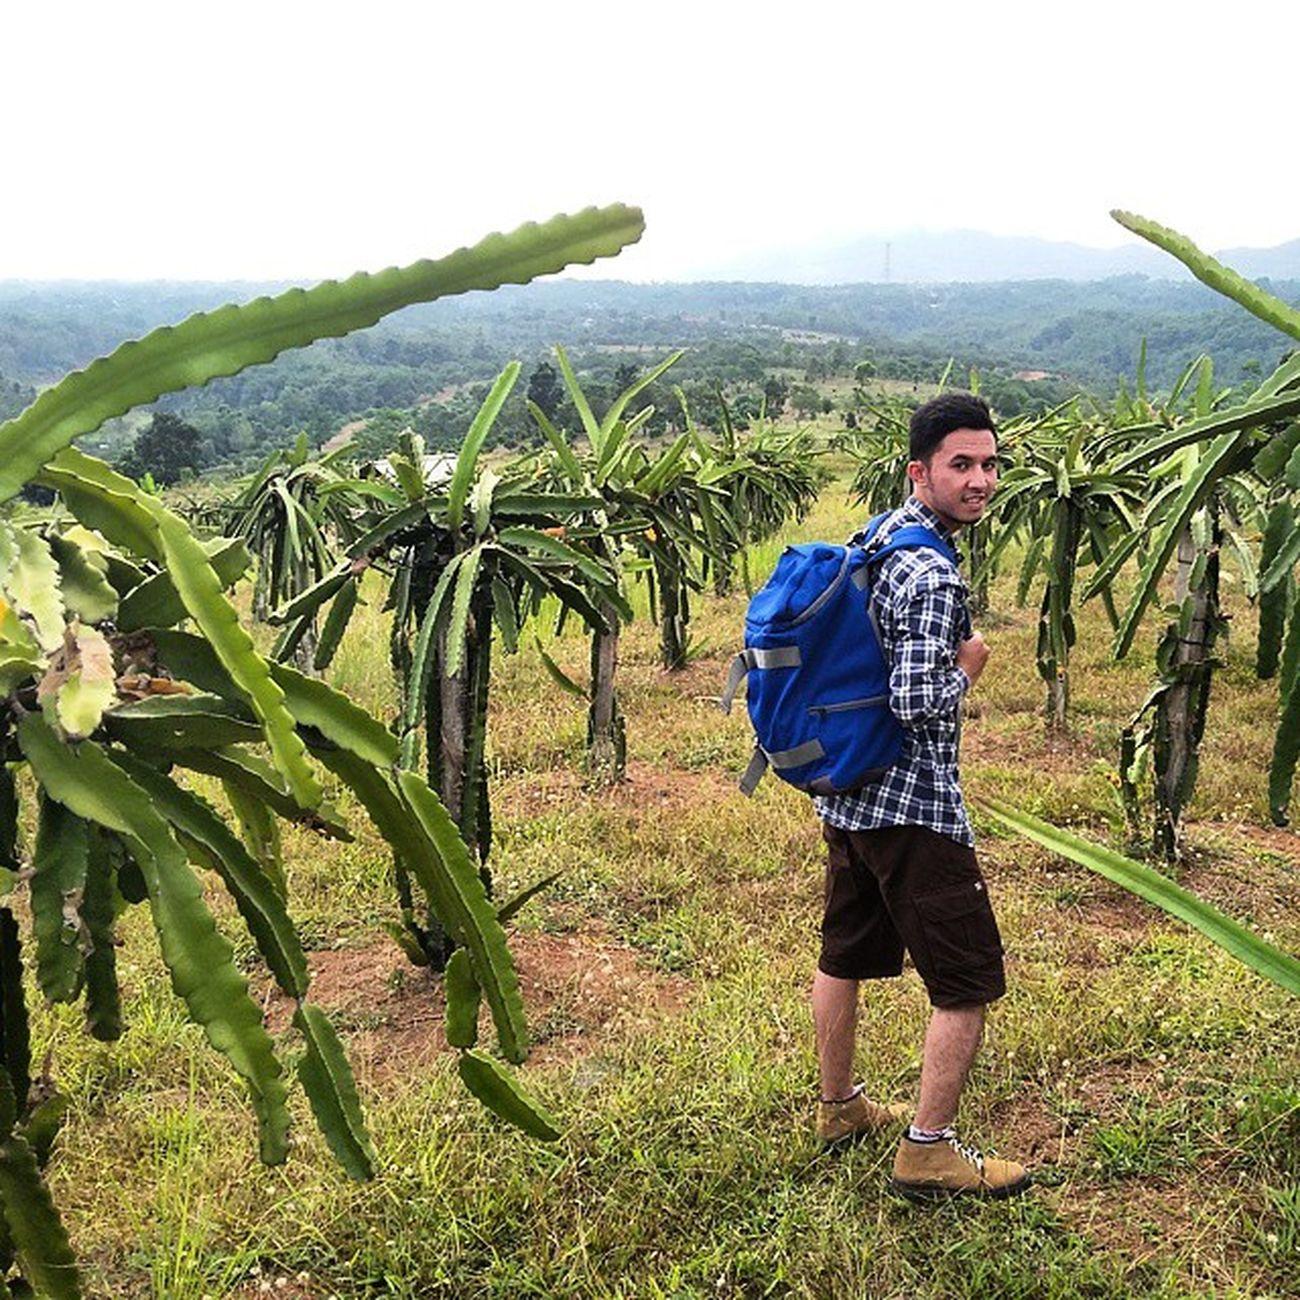 Mungkin saja buah naga yg pernah kamu makan itu berasal dari kebun ini.. Bags by : @sollubags Short pants by : @busanaarshop Lokasi : Dragon Fruits Garden, Cipatat Padalarang, Kab. Bandung Barat. Ridwanderful JarambahBandung DiBawahLangitBandung BandungIsMe TravelingPakeReceh